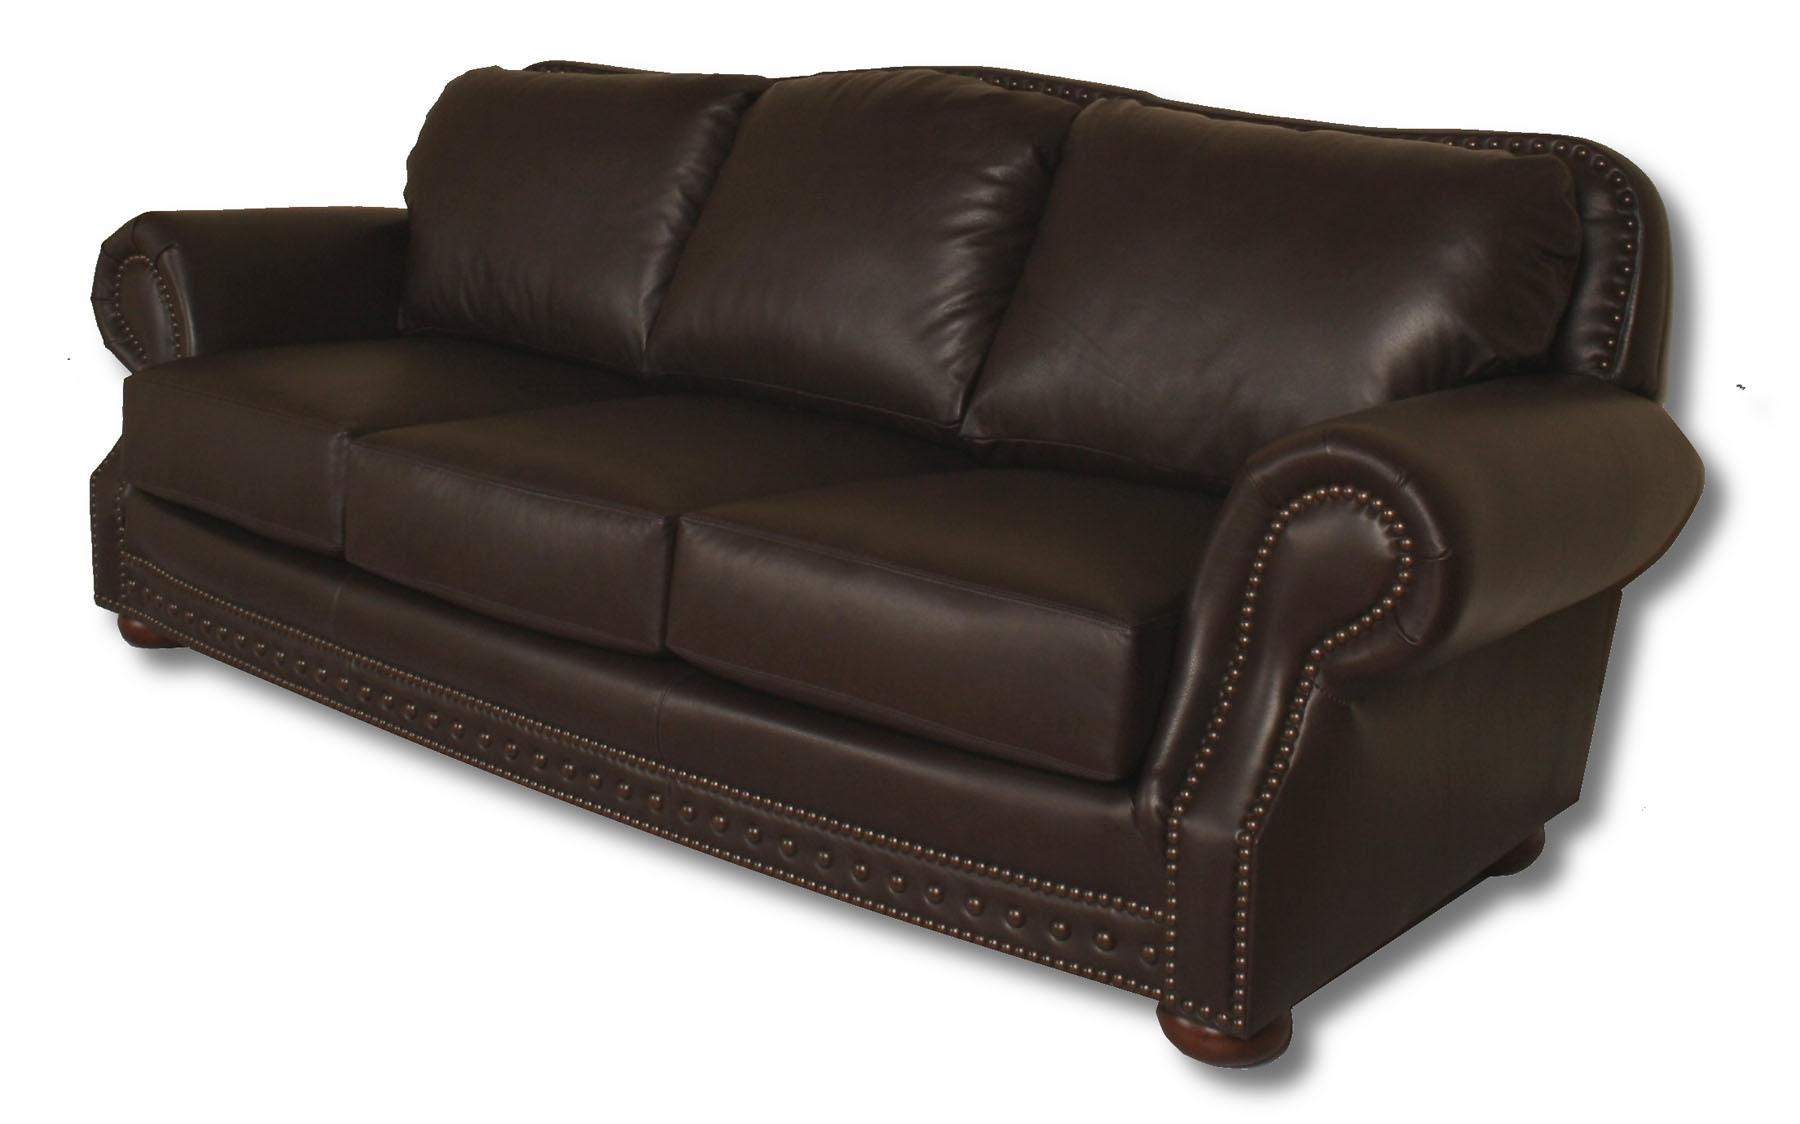 furniture row sofa wood carving designs millennium  leather